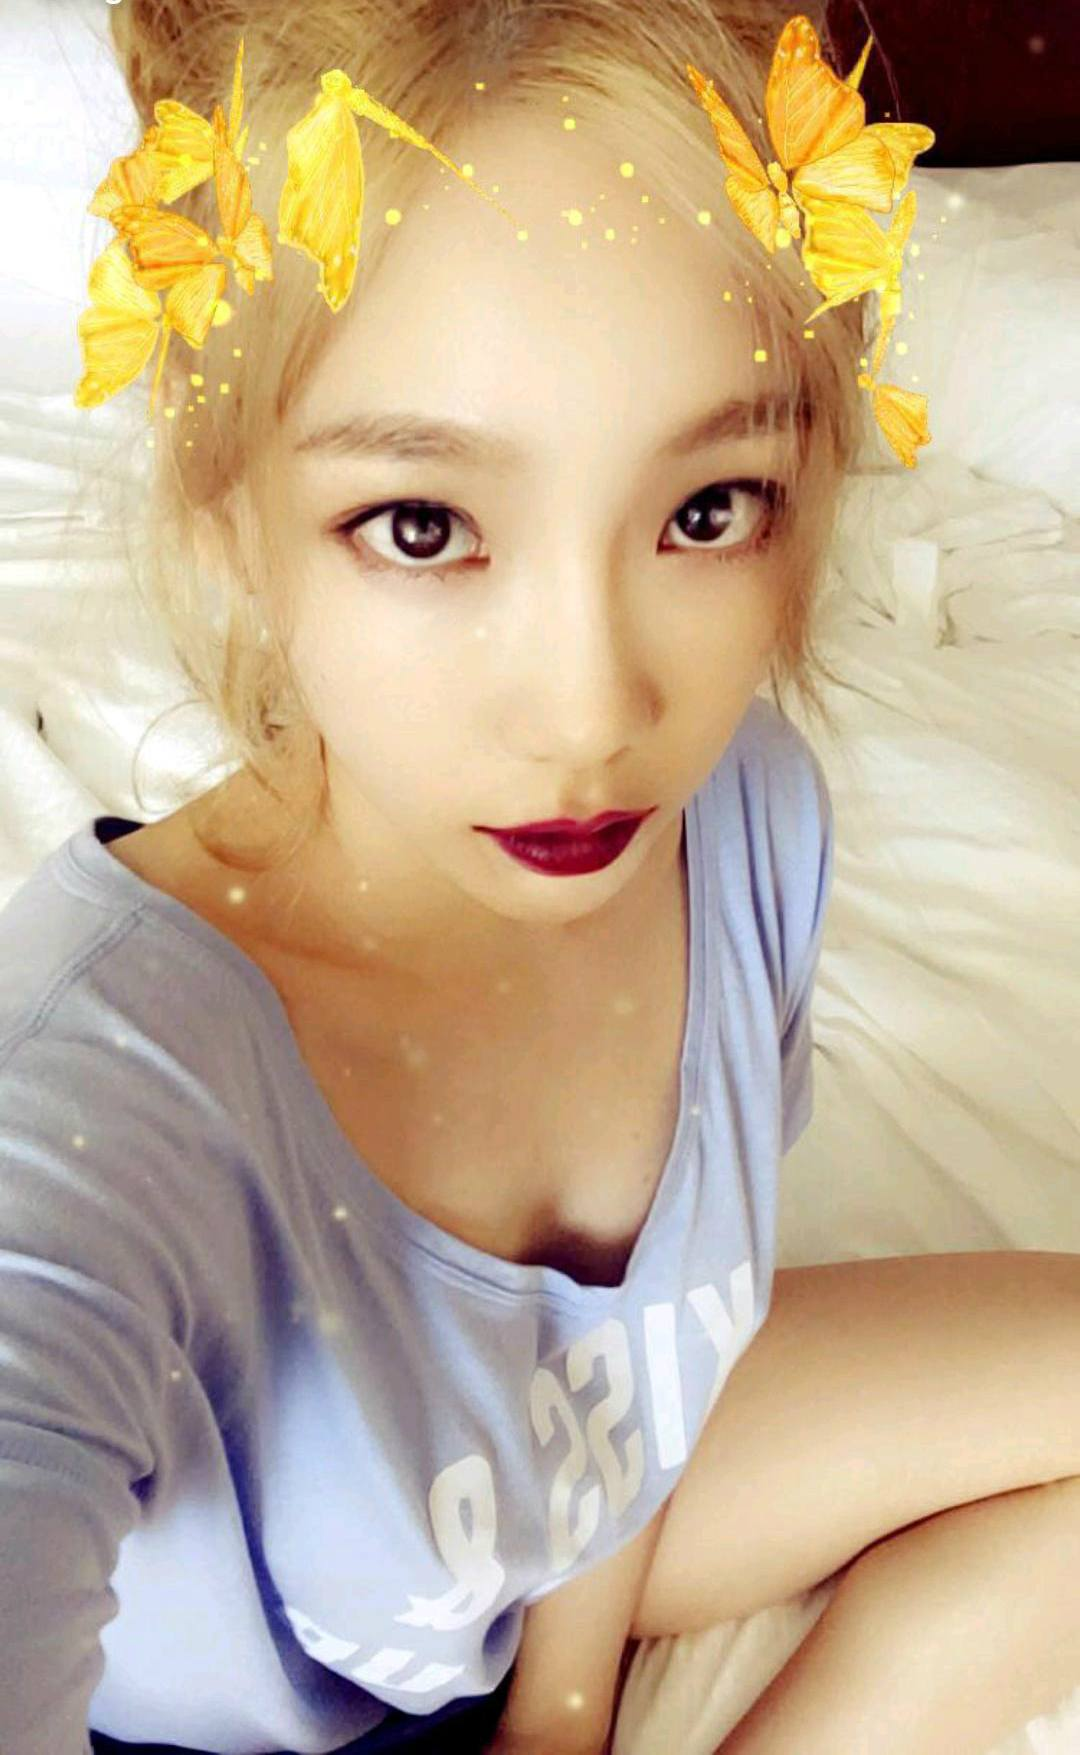 SNSD Taeyeon shares seductive pajama selfie with fans — Koreaboo Red Lipstick Photoshoot